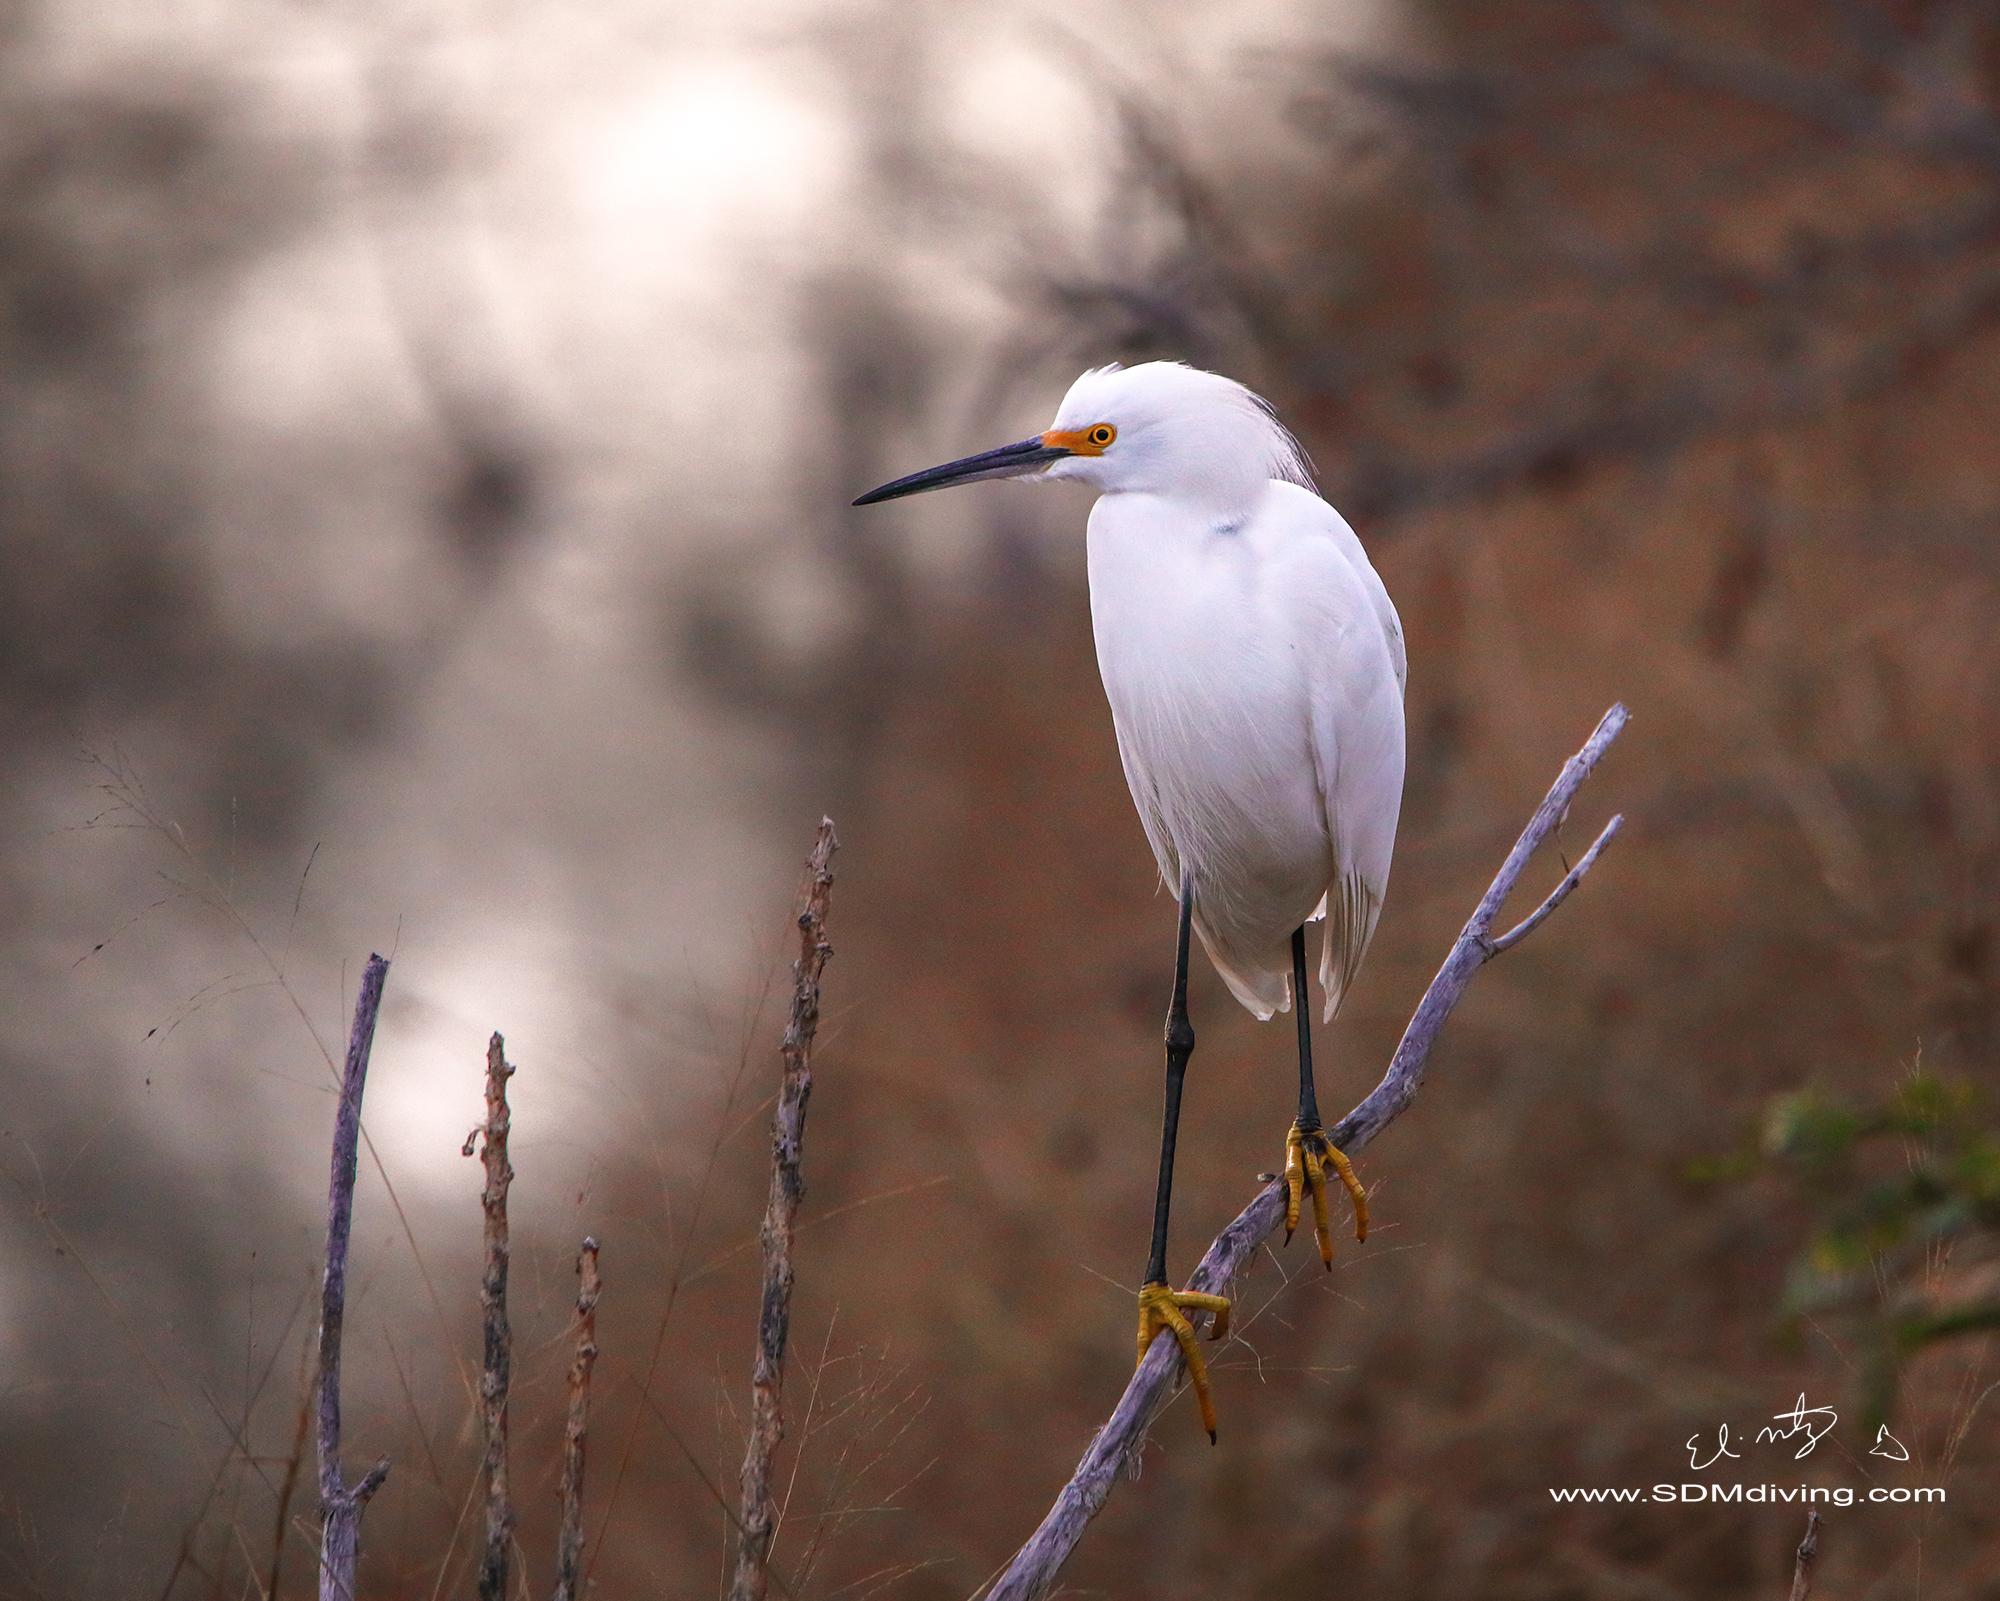 17. Snowy egret, off Edinburg Wetlands, TX.